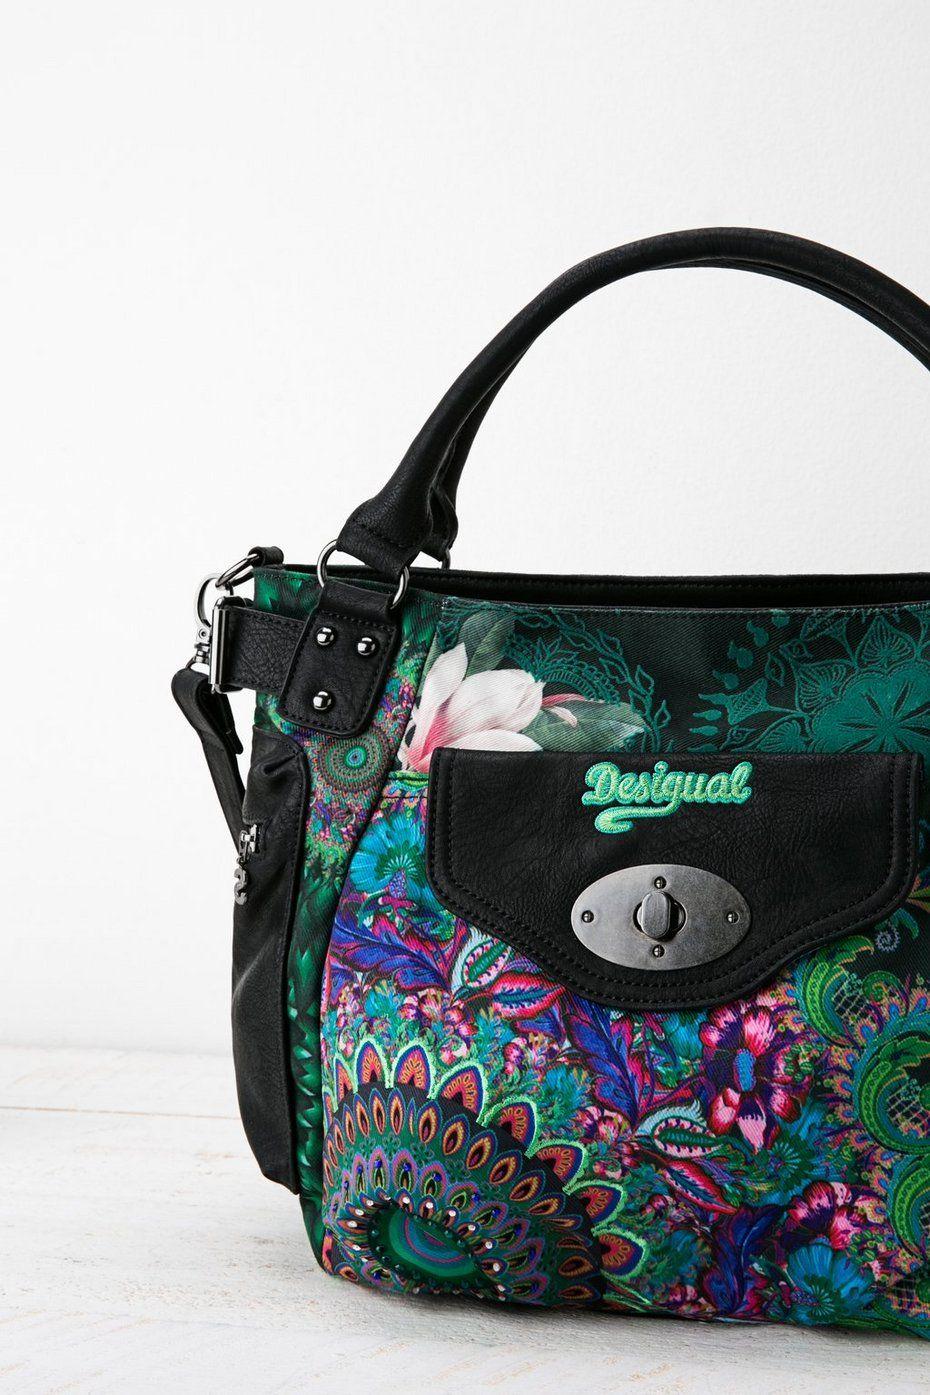 7b47d589d Women's bags in 2019   Clothes for me   Fashion, Purses, bags, Handbags